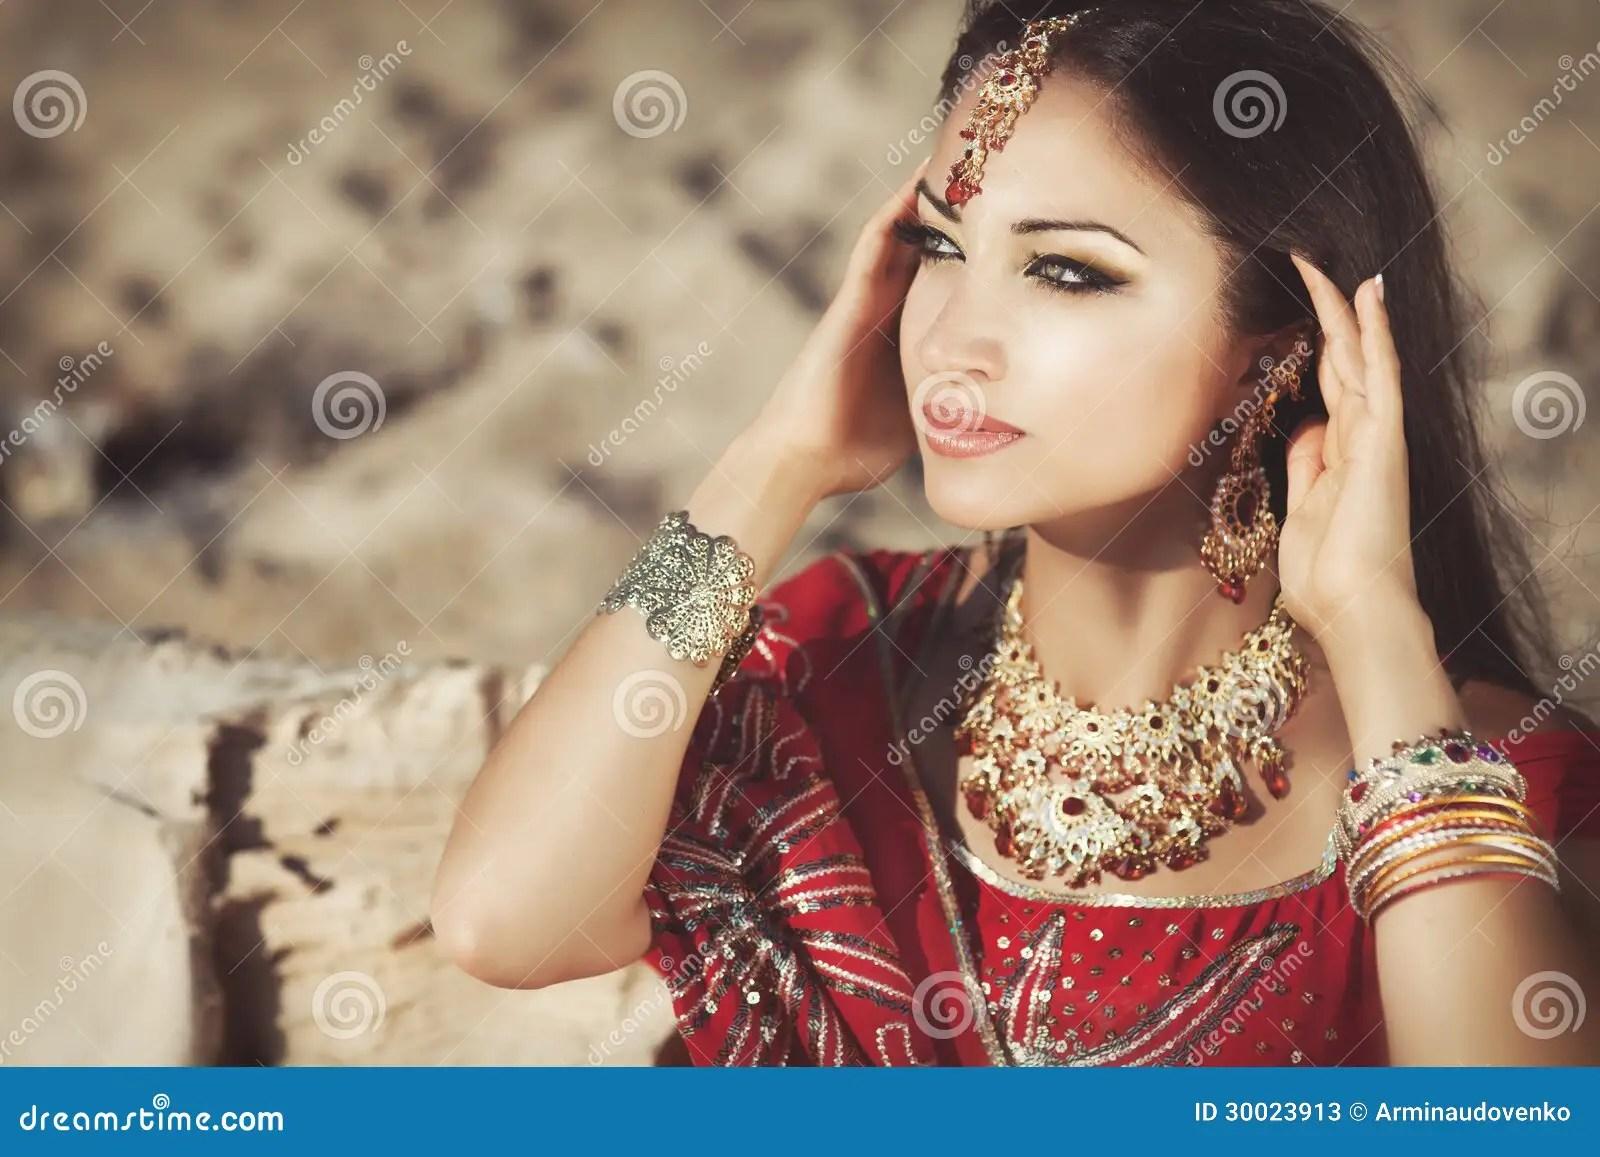 Beautiful Indian Woman Bellydancer Arabian Bride Stock